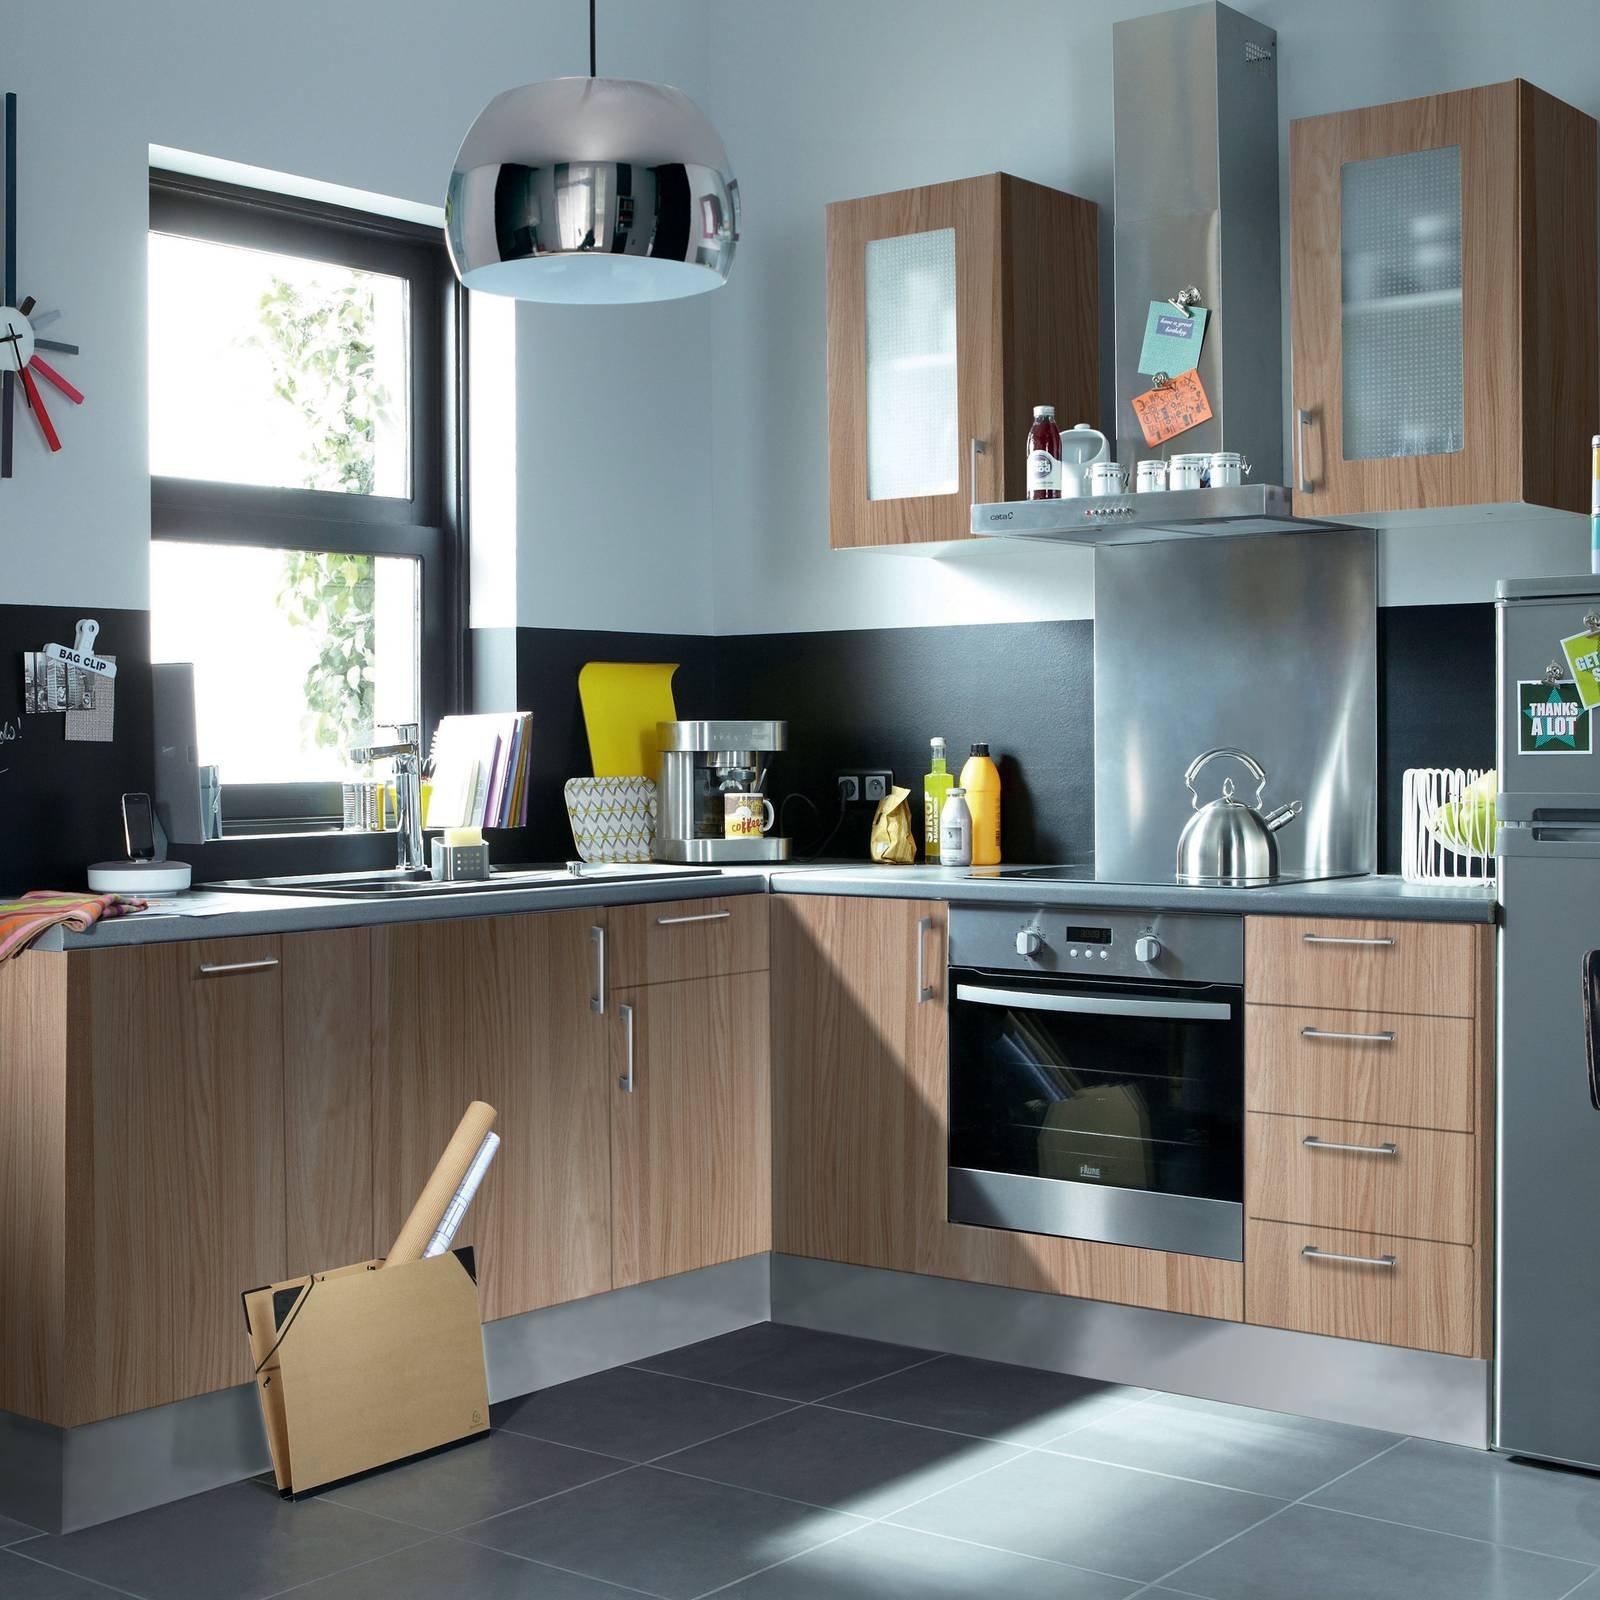 Cucine Moderne Per Ambienti Piccoli.Awesome Cucine Moderne Per Piccoli Spazi Photos Home Design